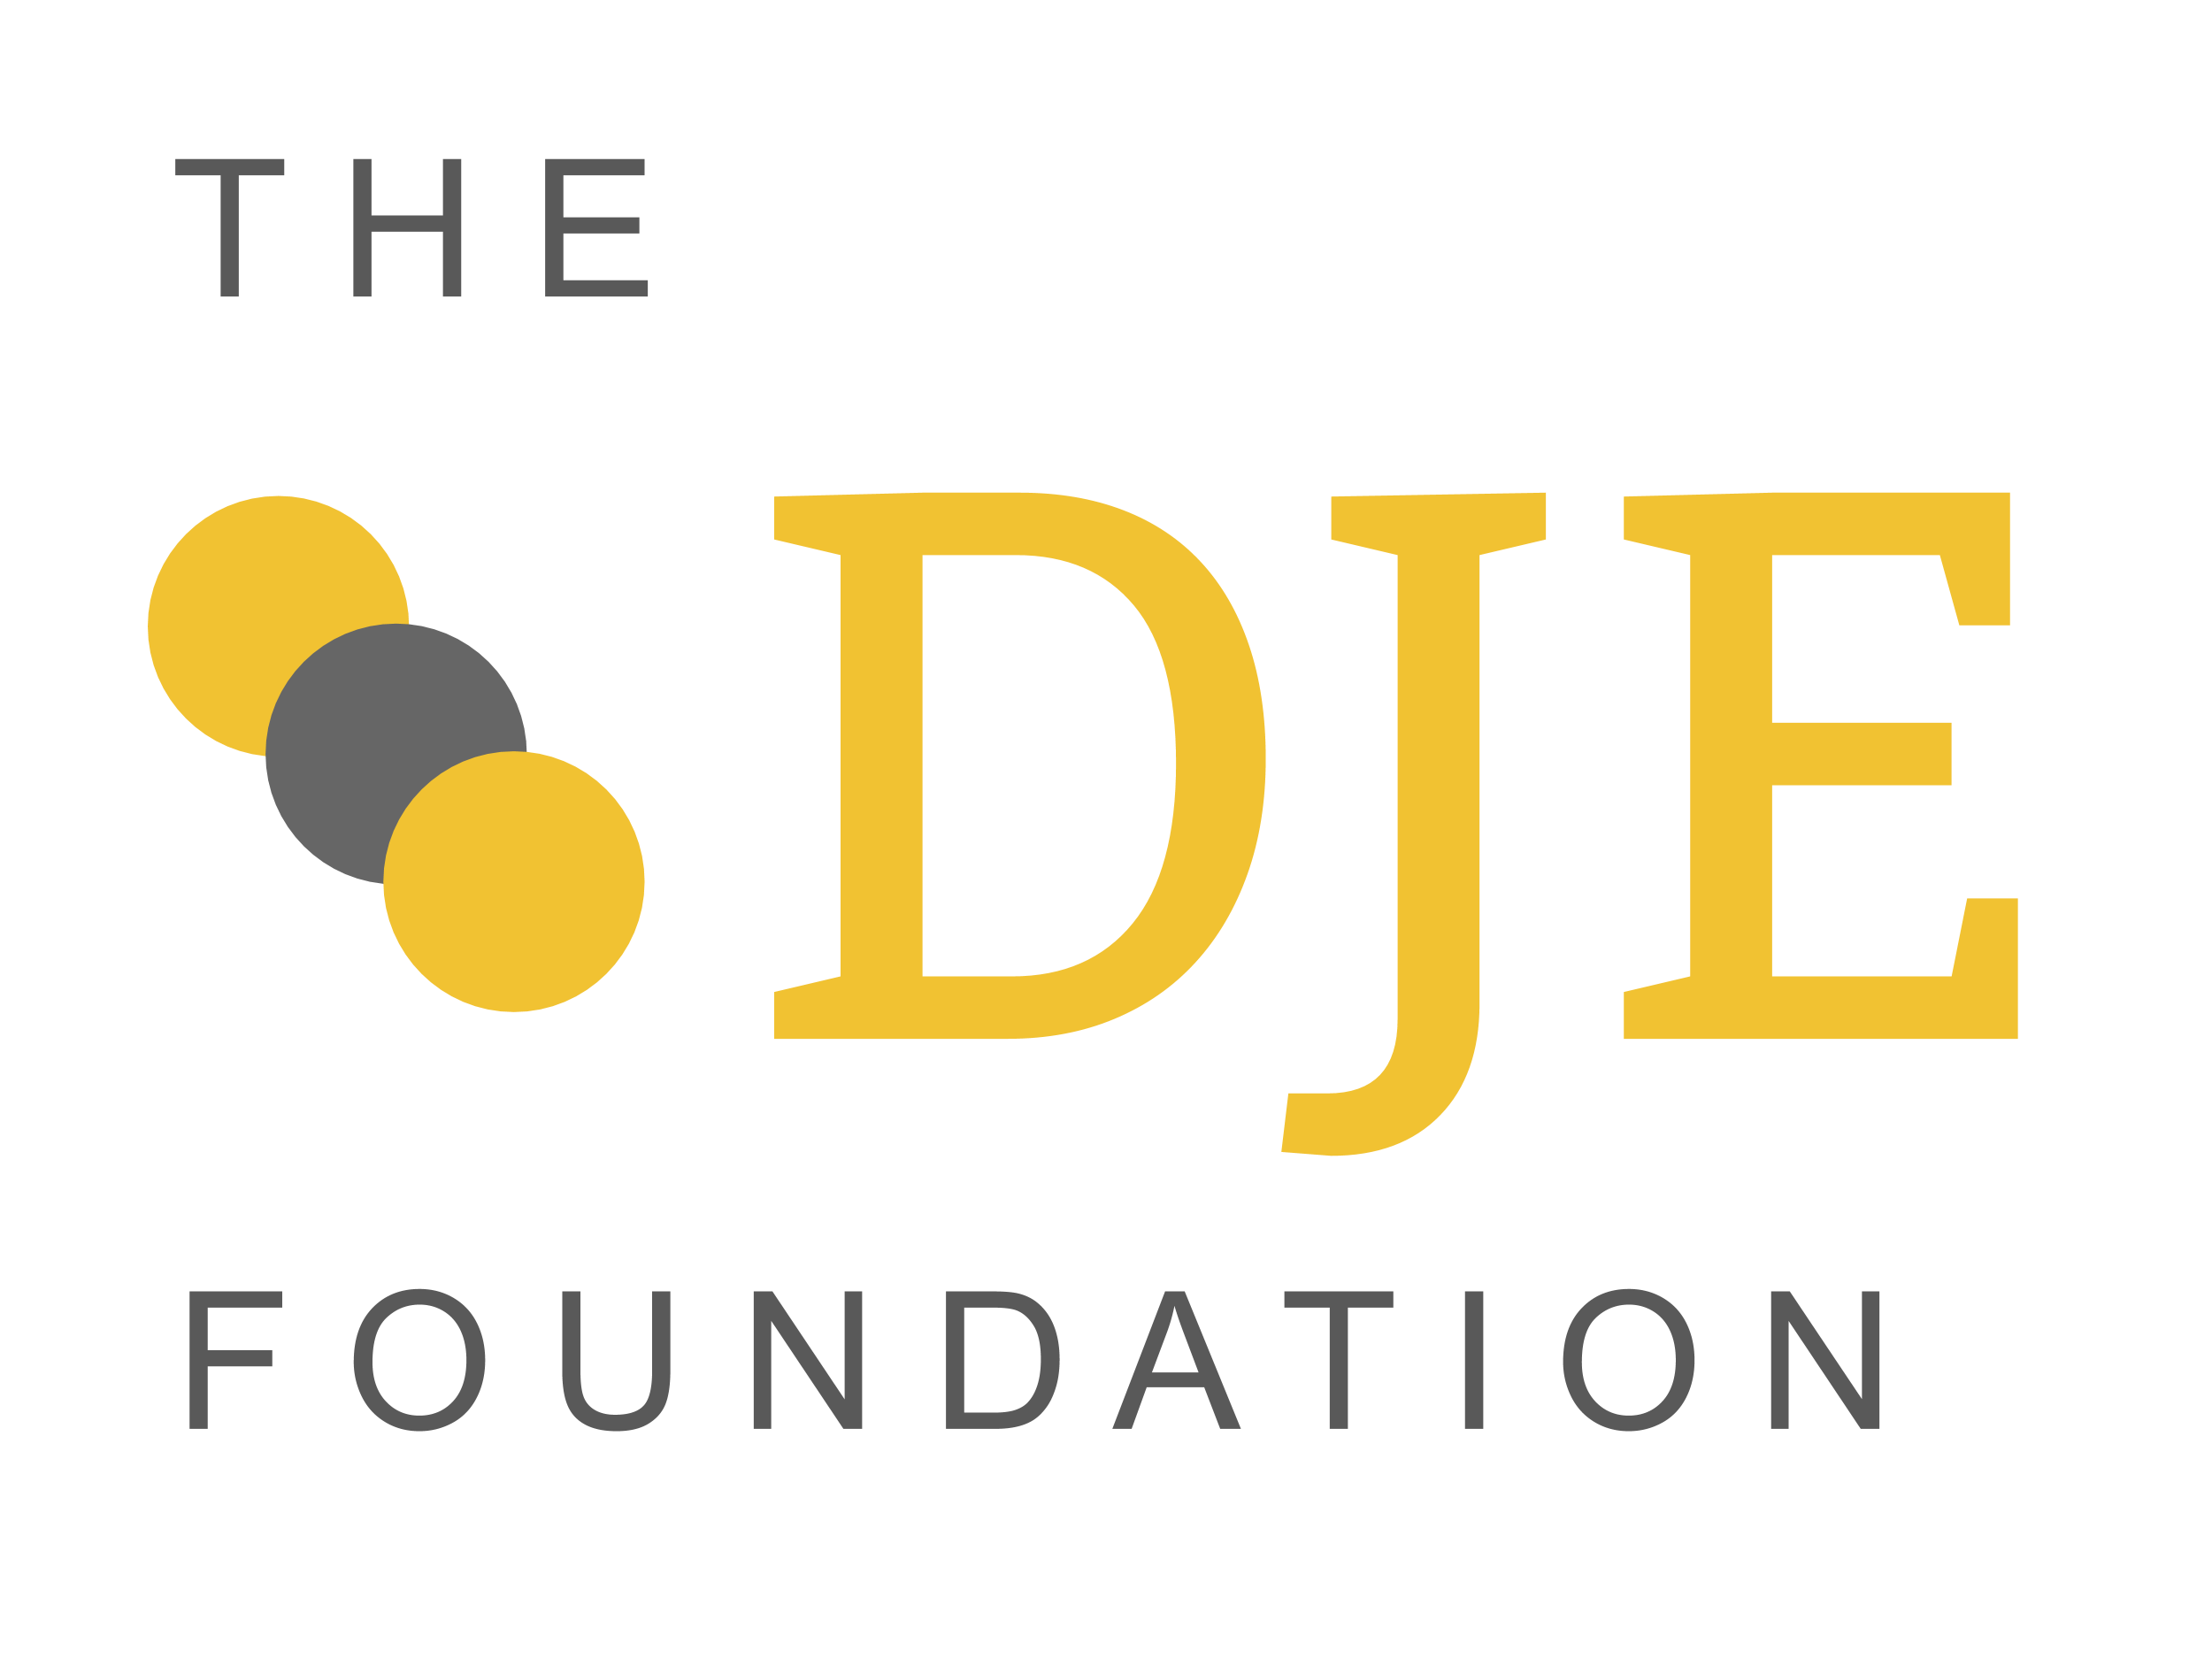 The DJE Foundation